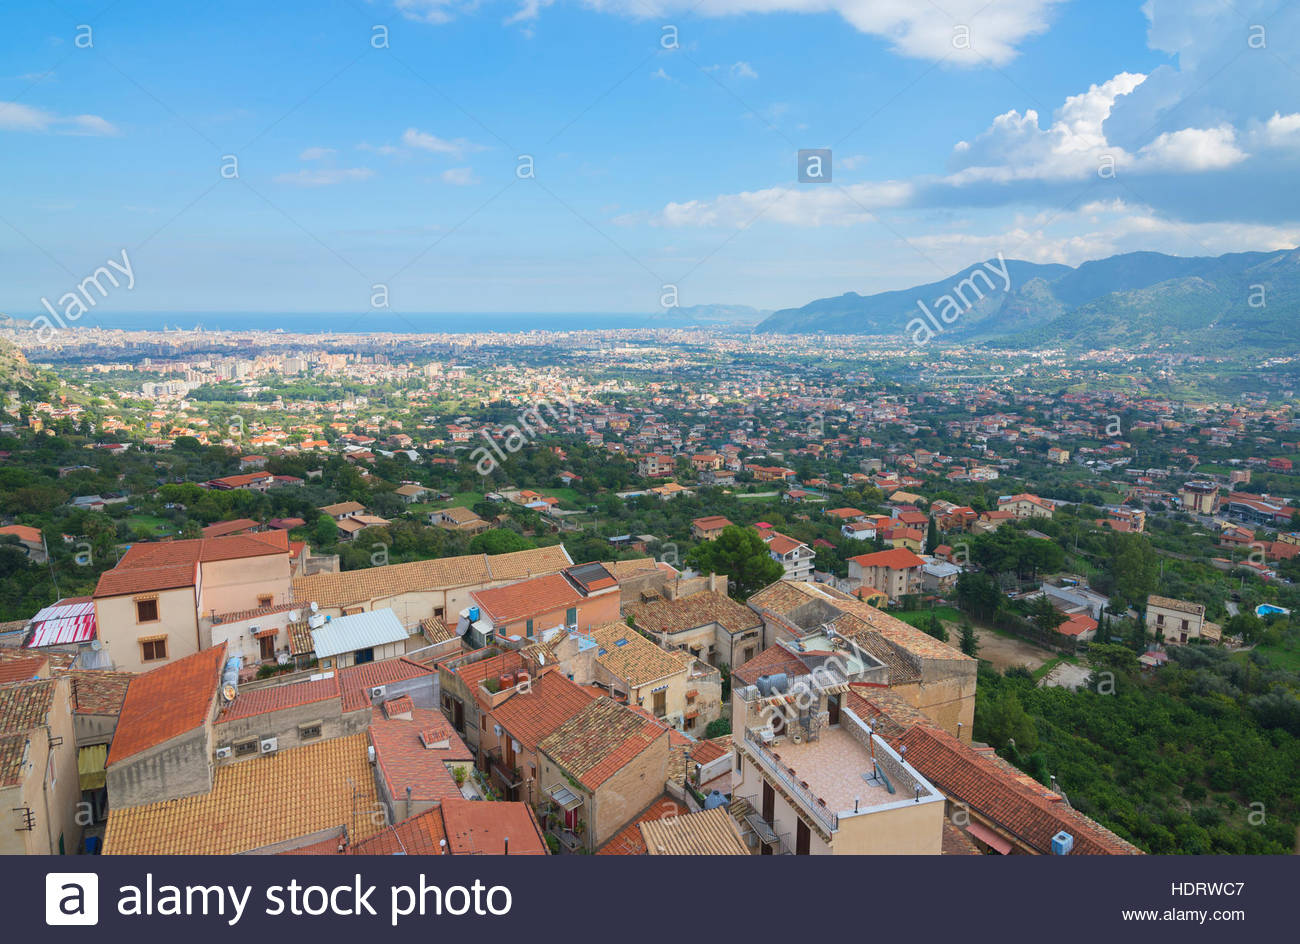 Monreale-Ansicht von Monreale Kathedrale Monreale, Sizilien, Italien Stockbild